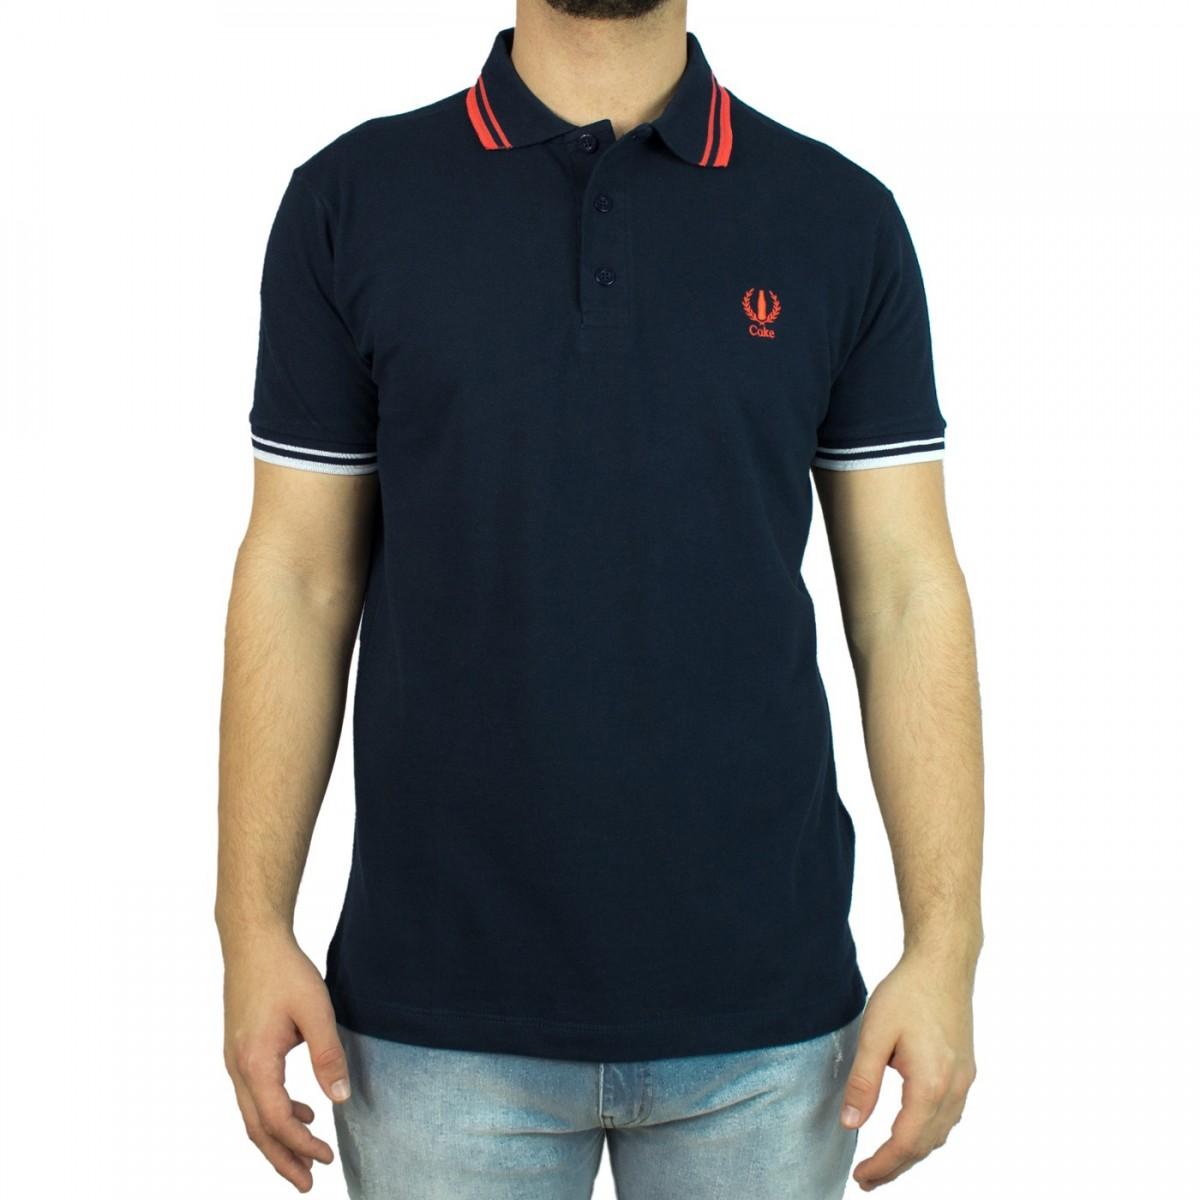 be38843b261ff Bizz Store - Camisa Polo Masculina Coca-Cola Manga Curta